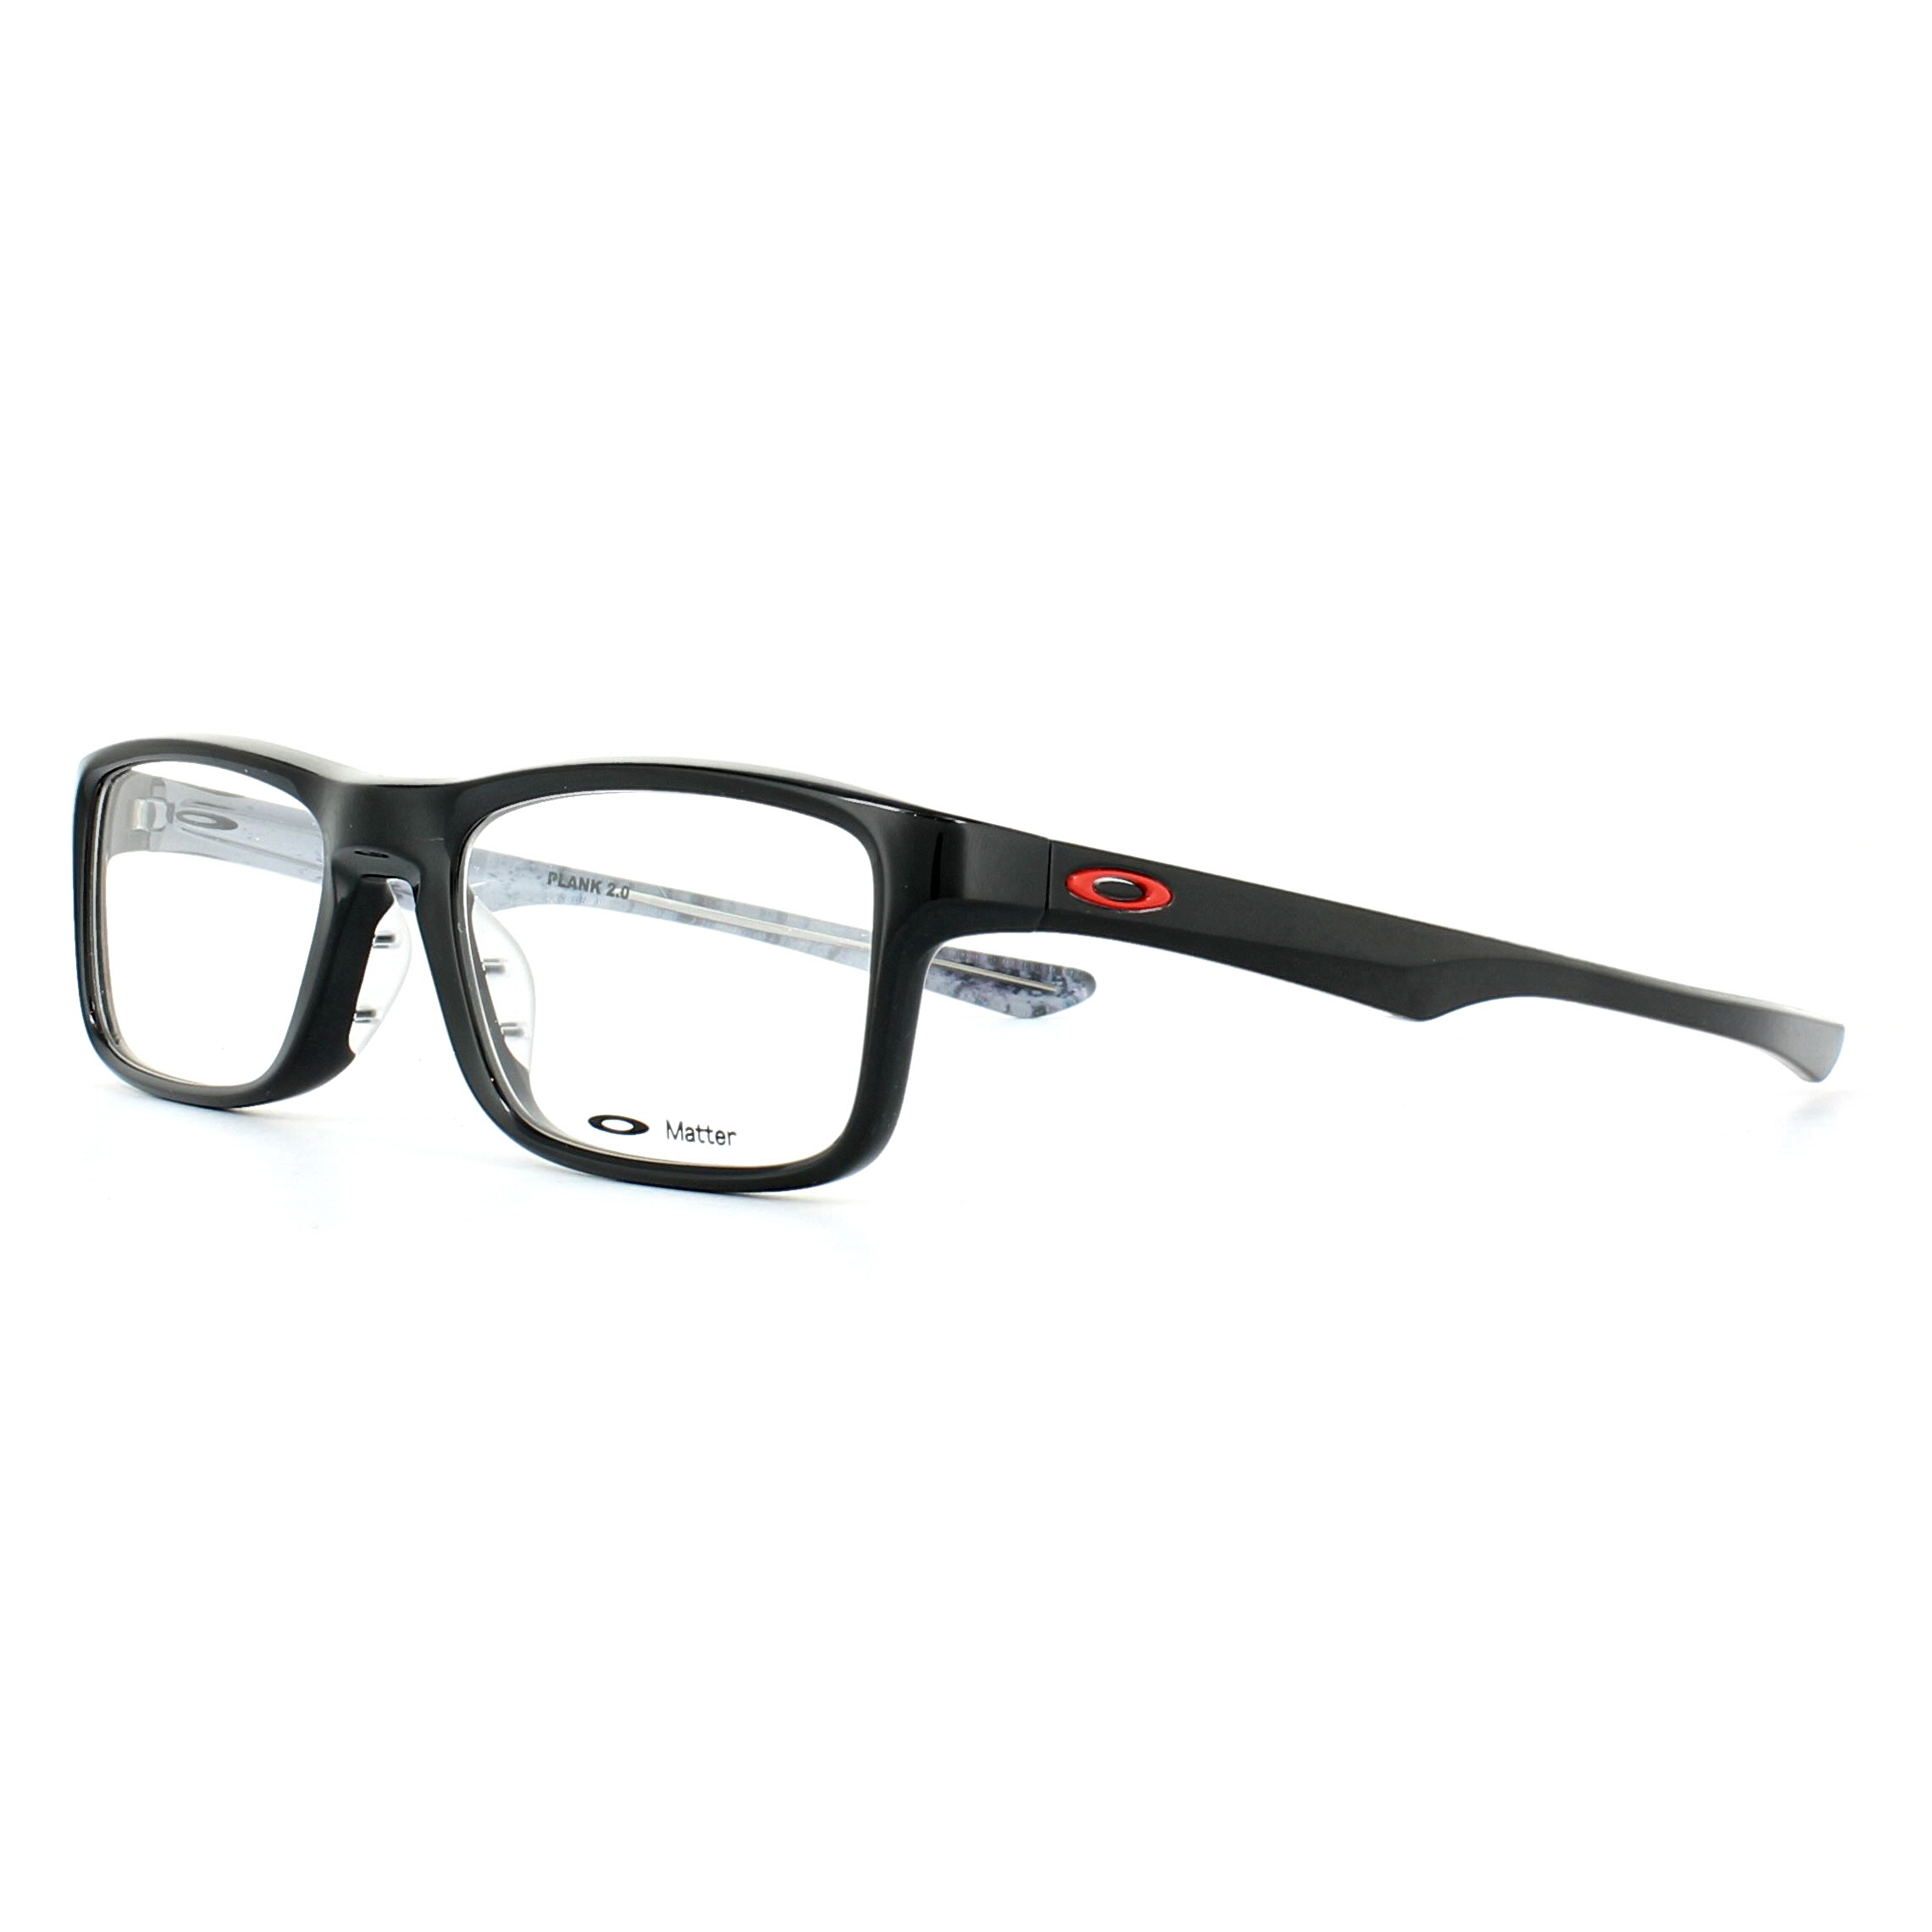 d1c7807aed Sentinel Oakley Glasses Frames Plank 2.0 OX8081-02 Polished Black 51mm Mens